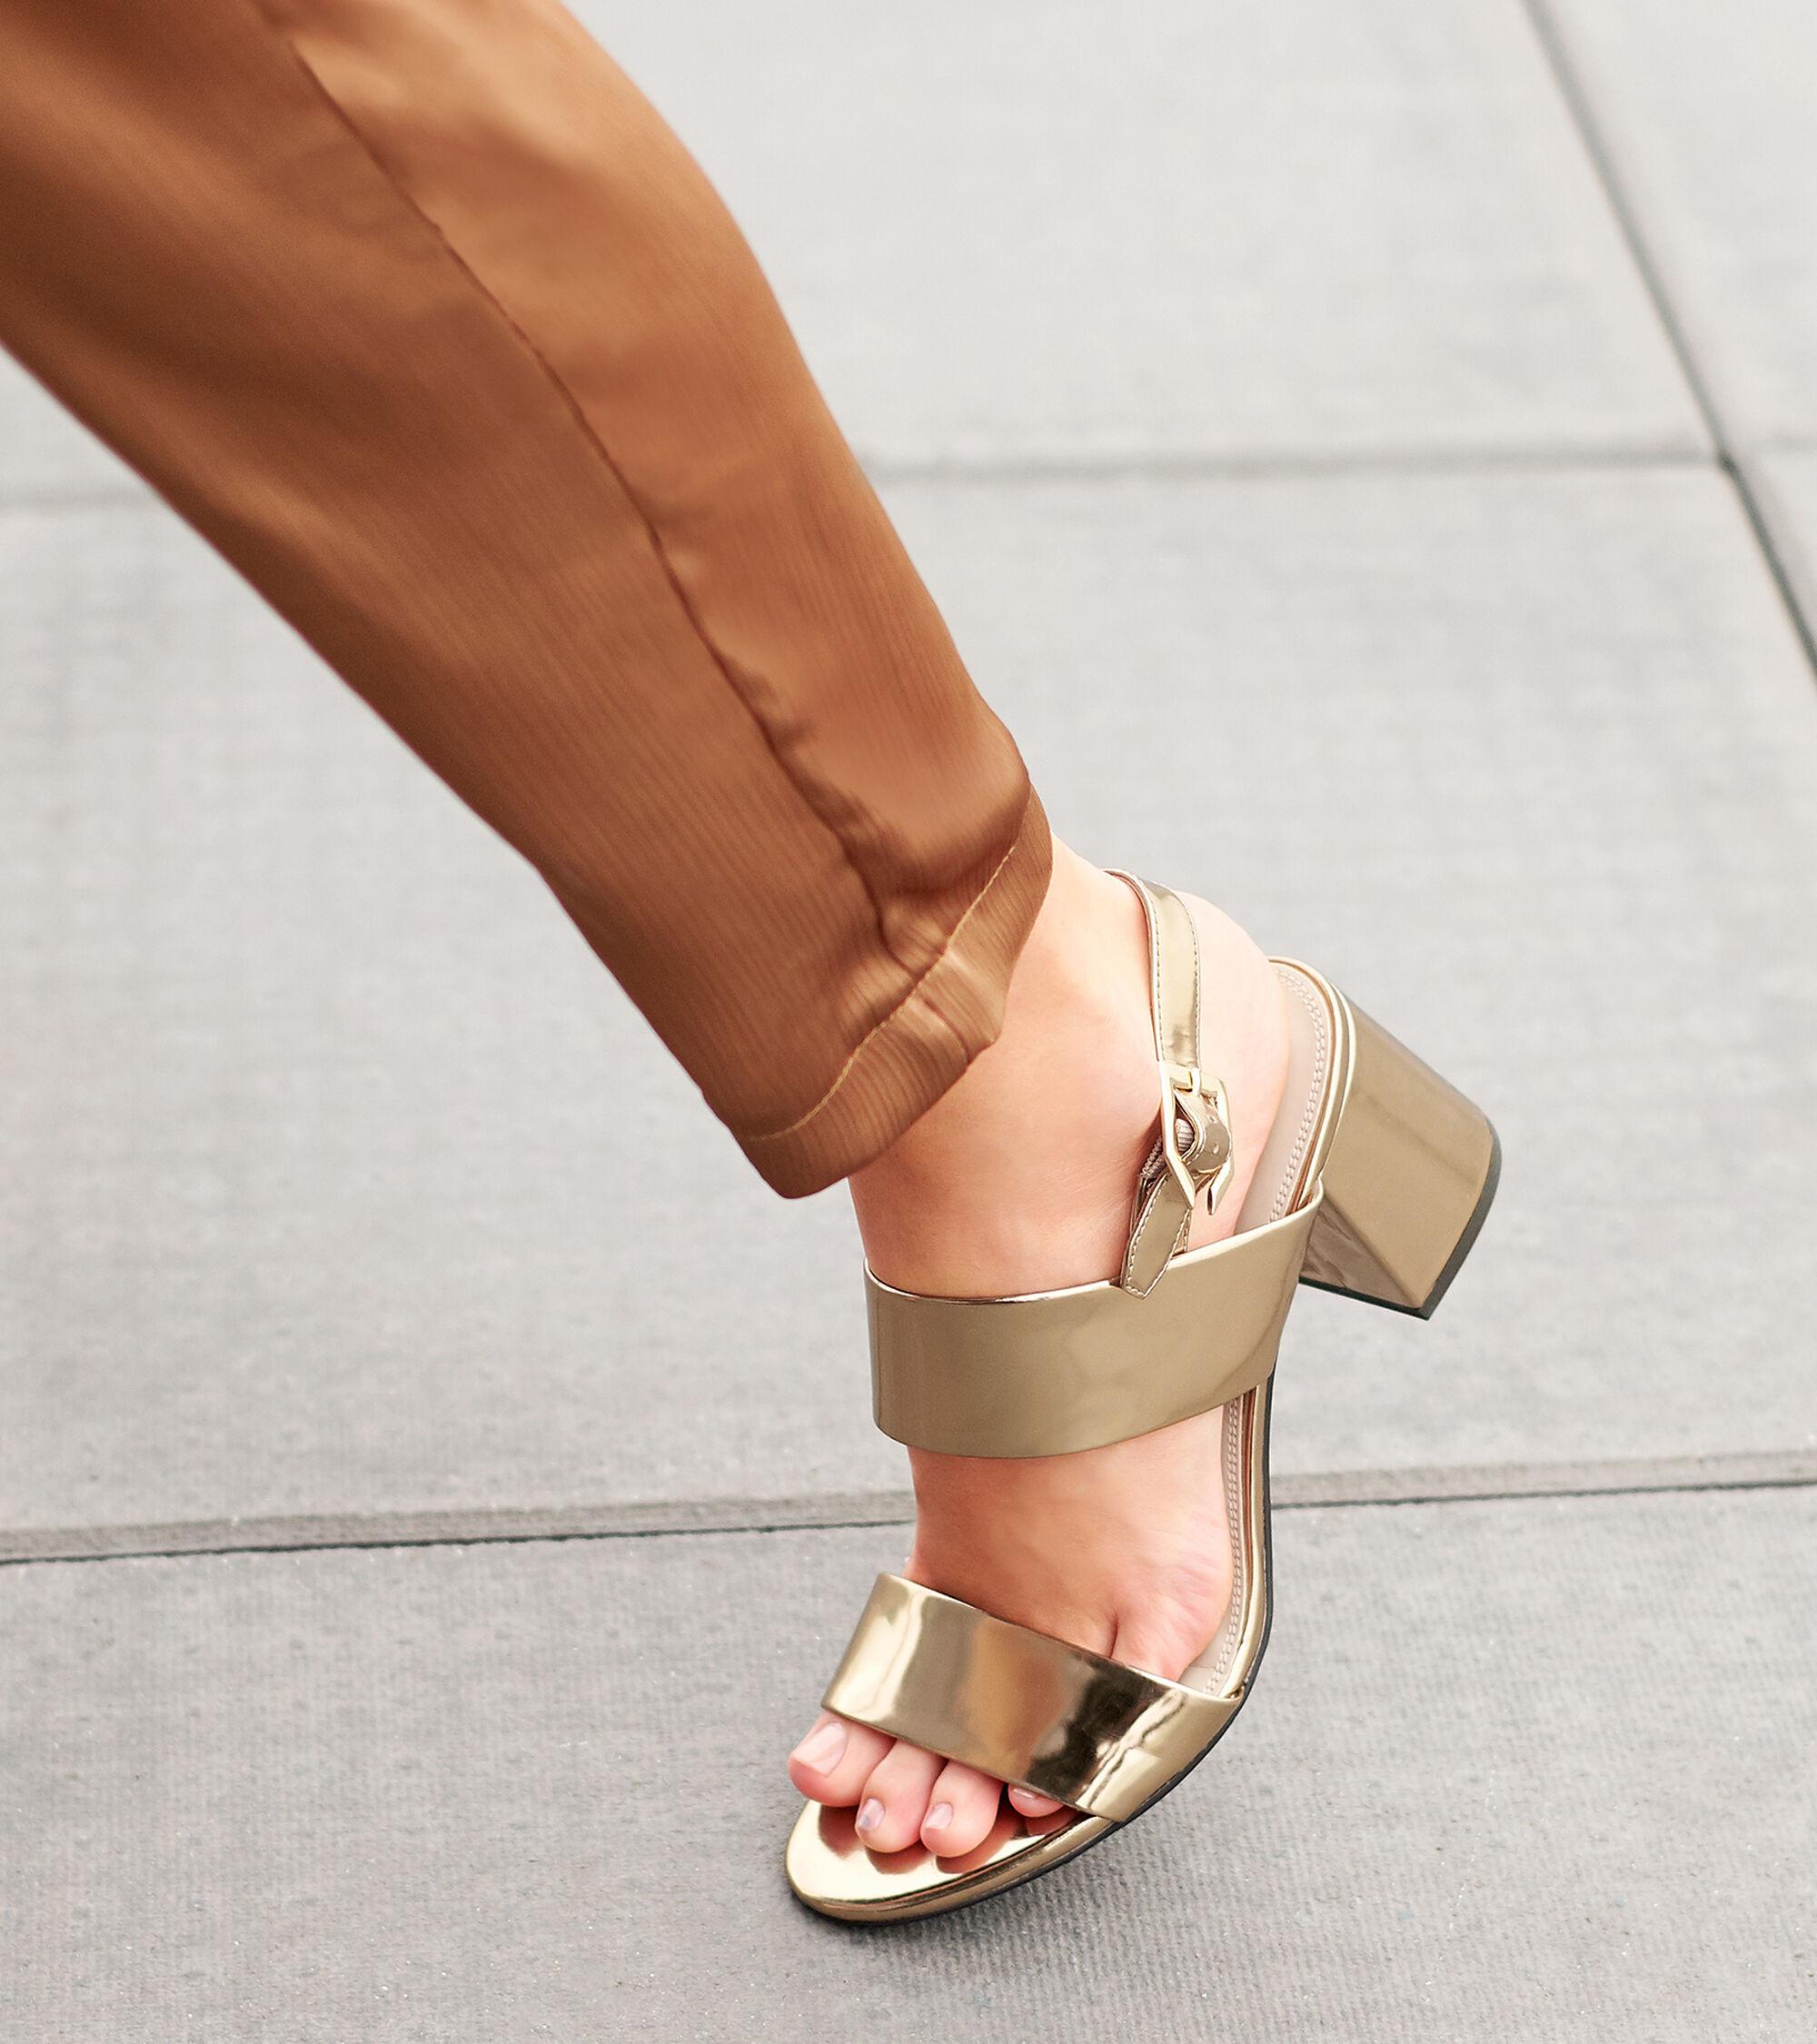 8fa0cb72ca Women's Avani City Sandals 65mm in Gold | Cole Haan